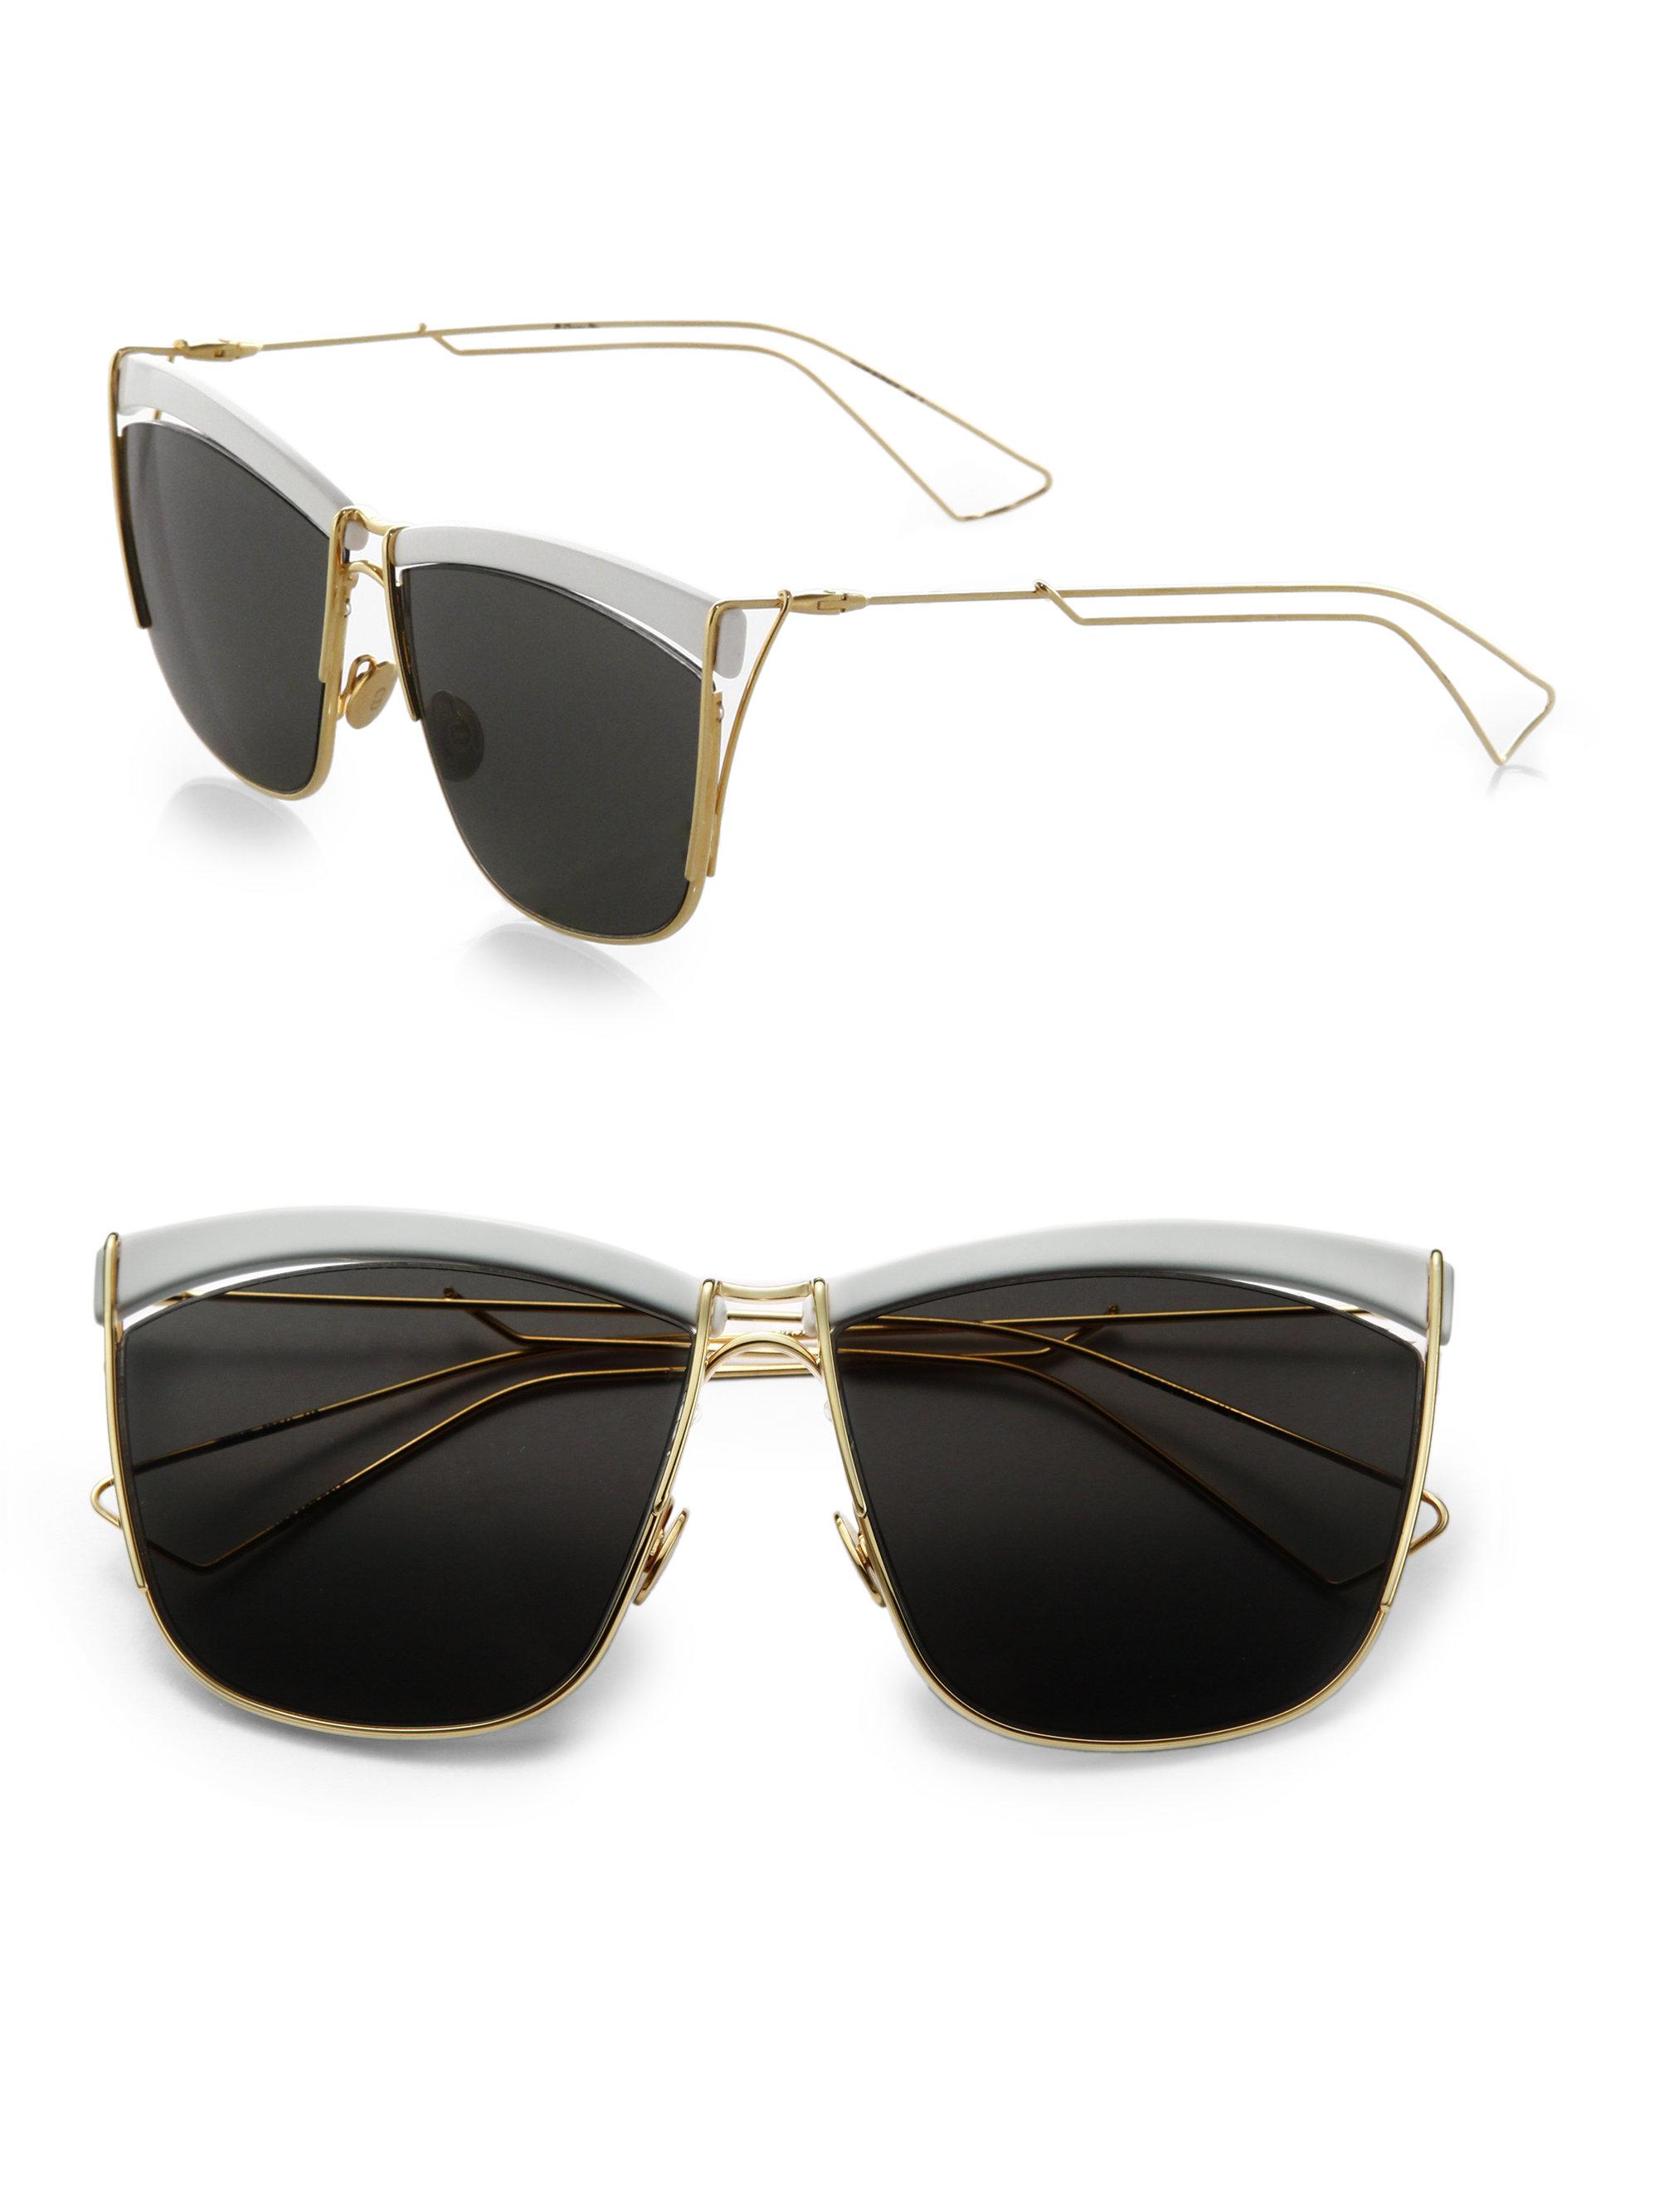 Dior Sunglasses Men